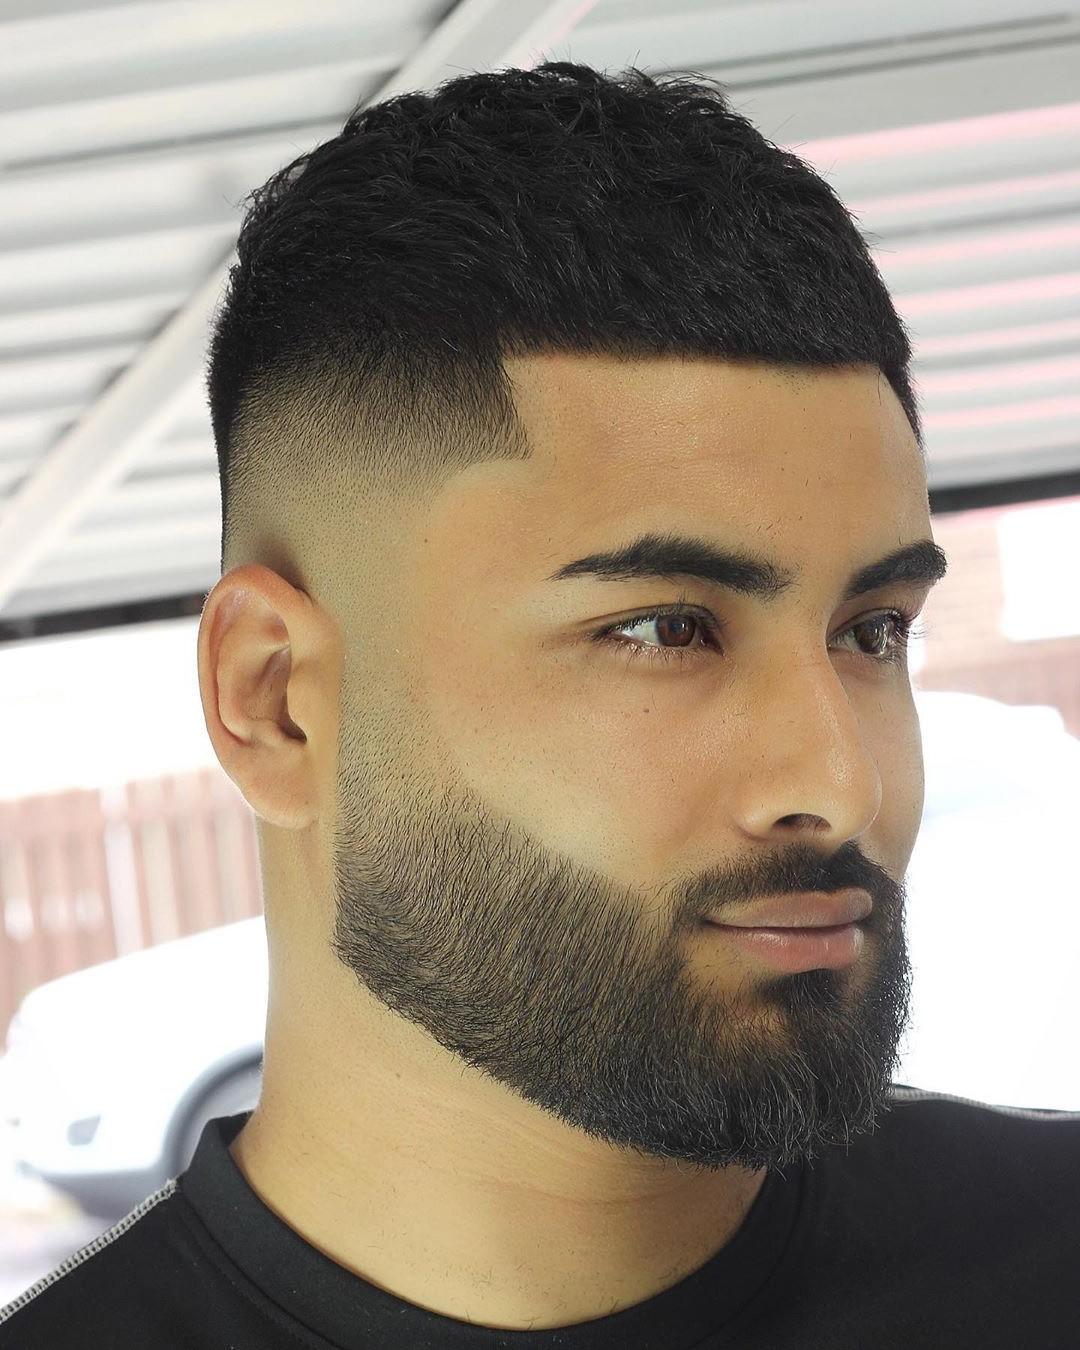 Mid Fade + Black Hair